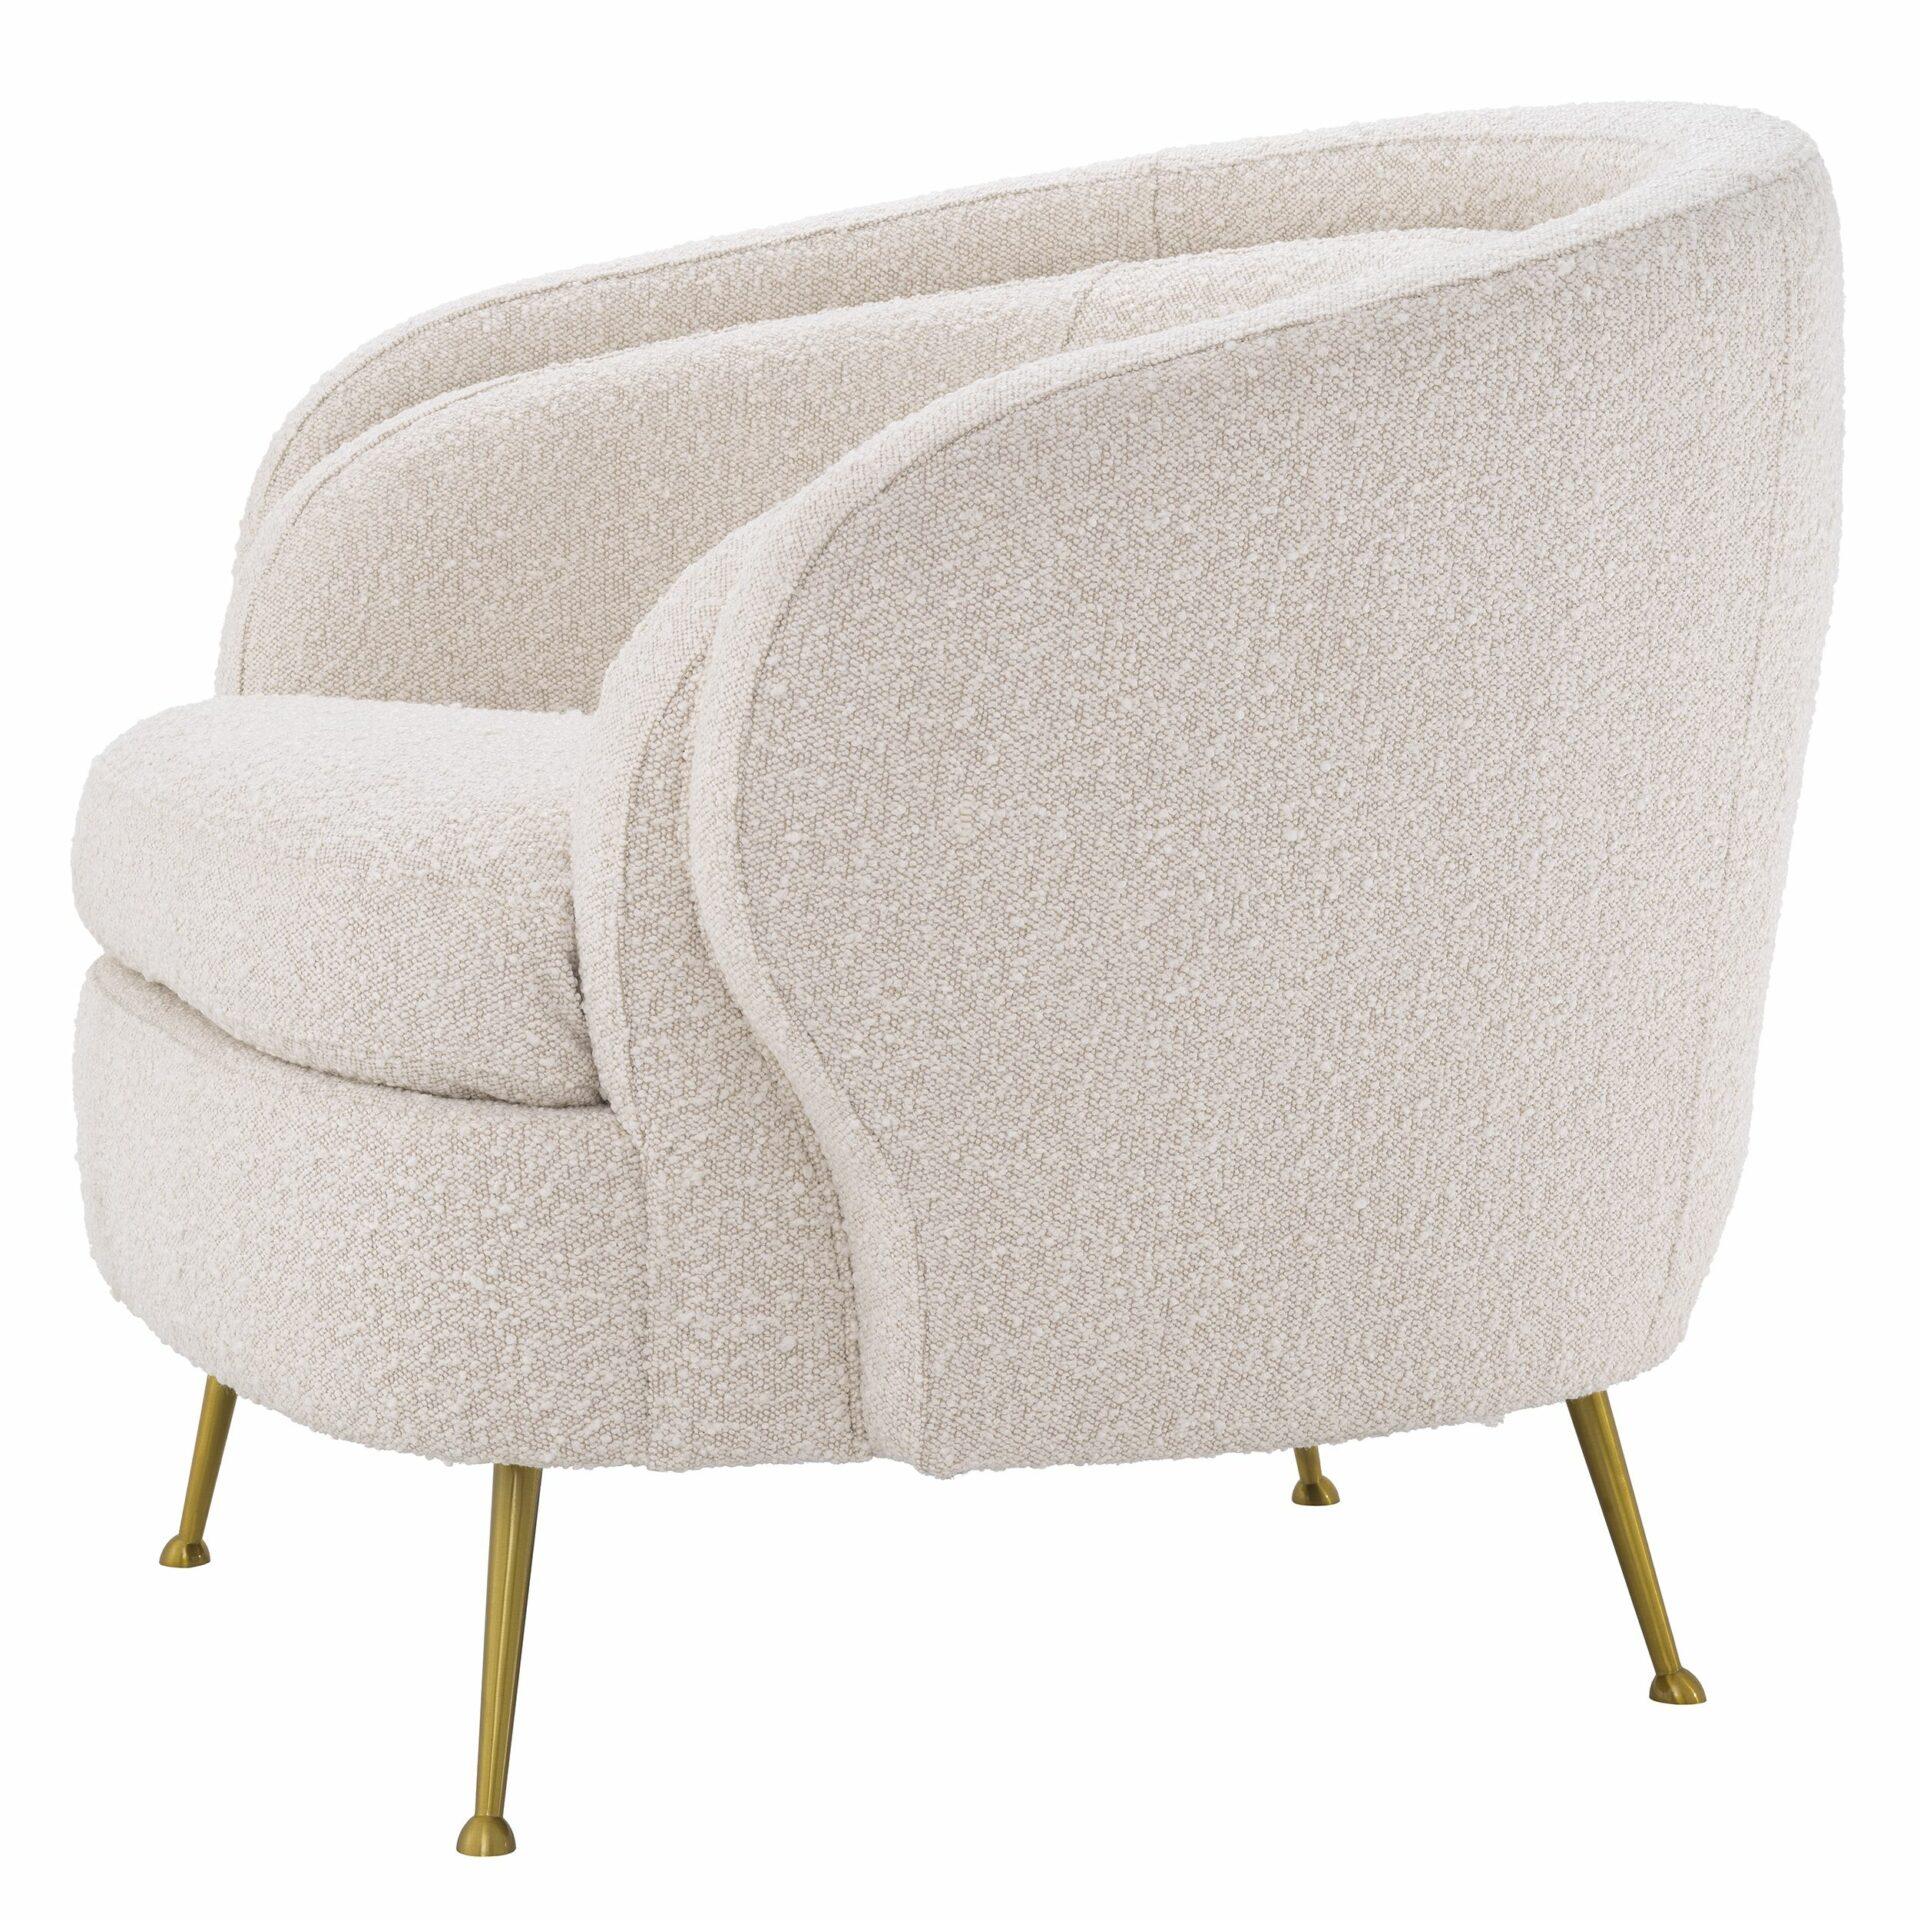 chair-orion-eichholtz-boucle-03